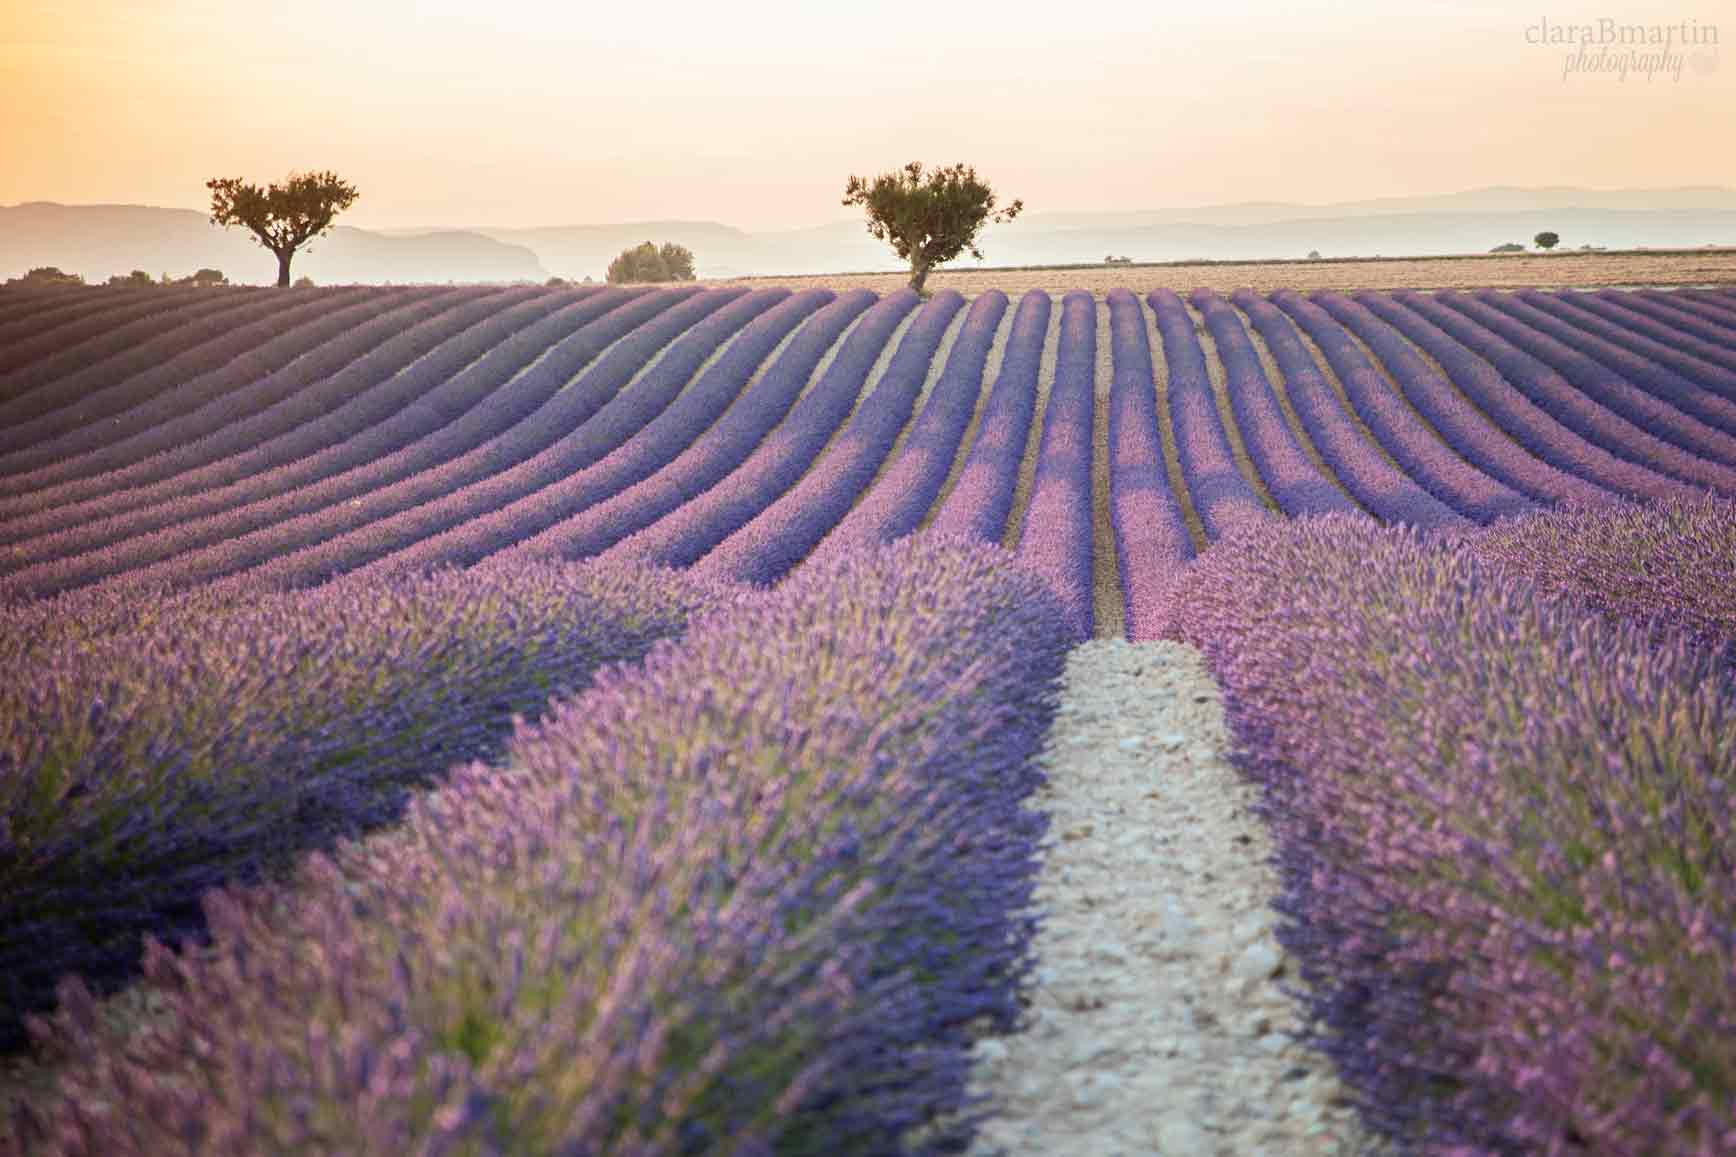 Lavender-fields-Provence-claraBmartin13